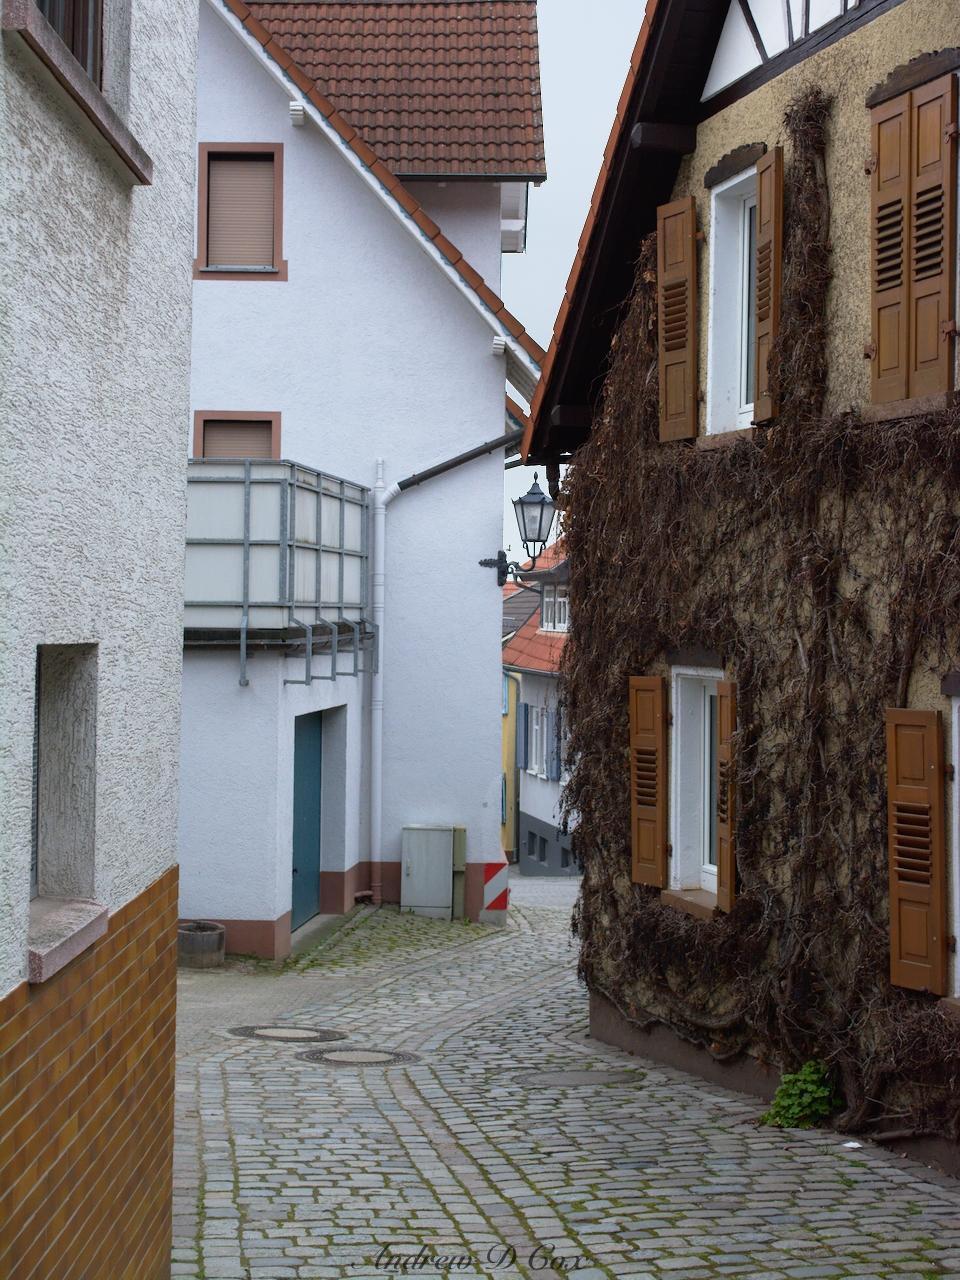 Map Zwingenberg Germany.A Walk Between German Castles Backcountry Sights